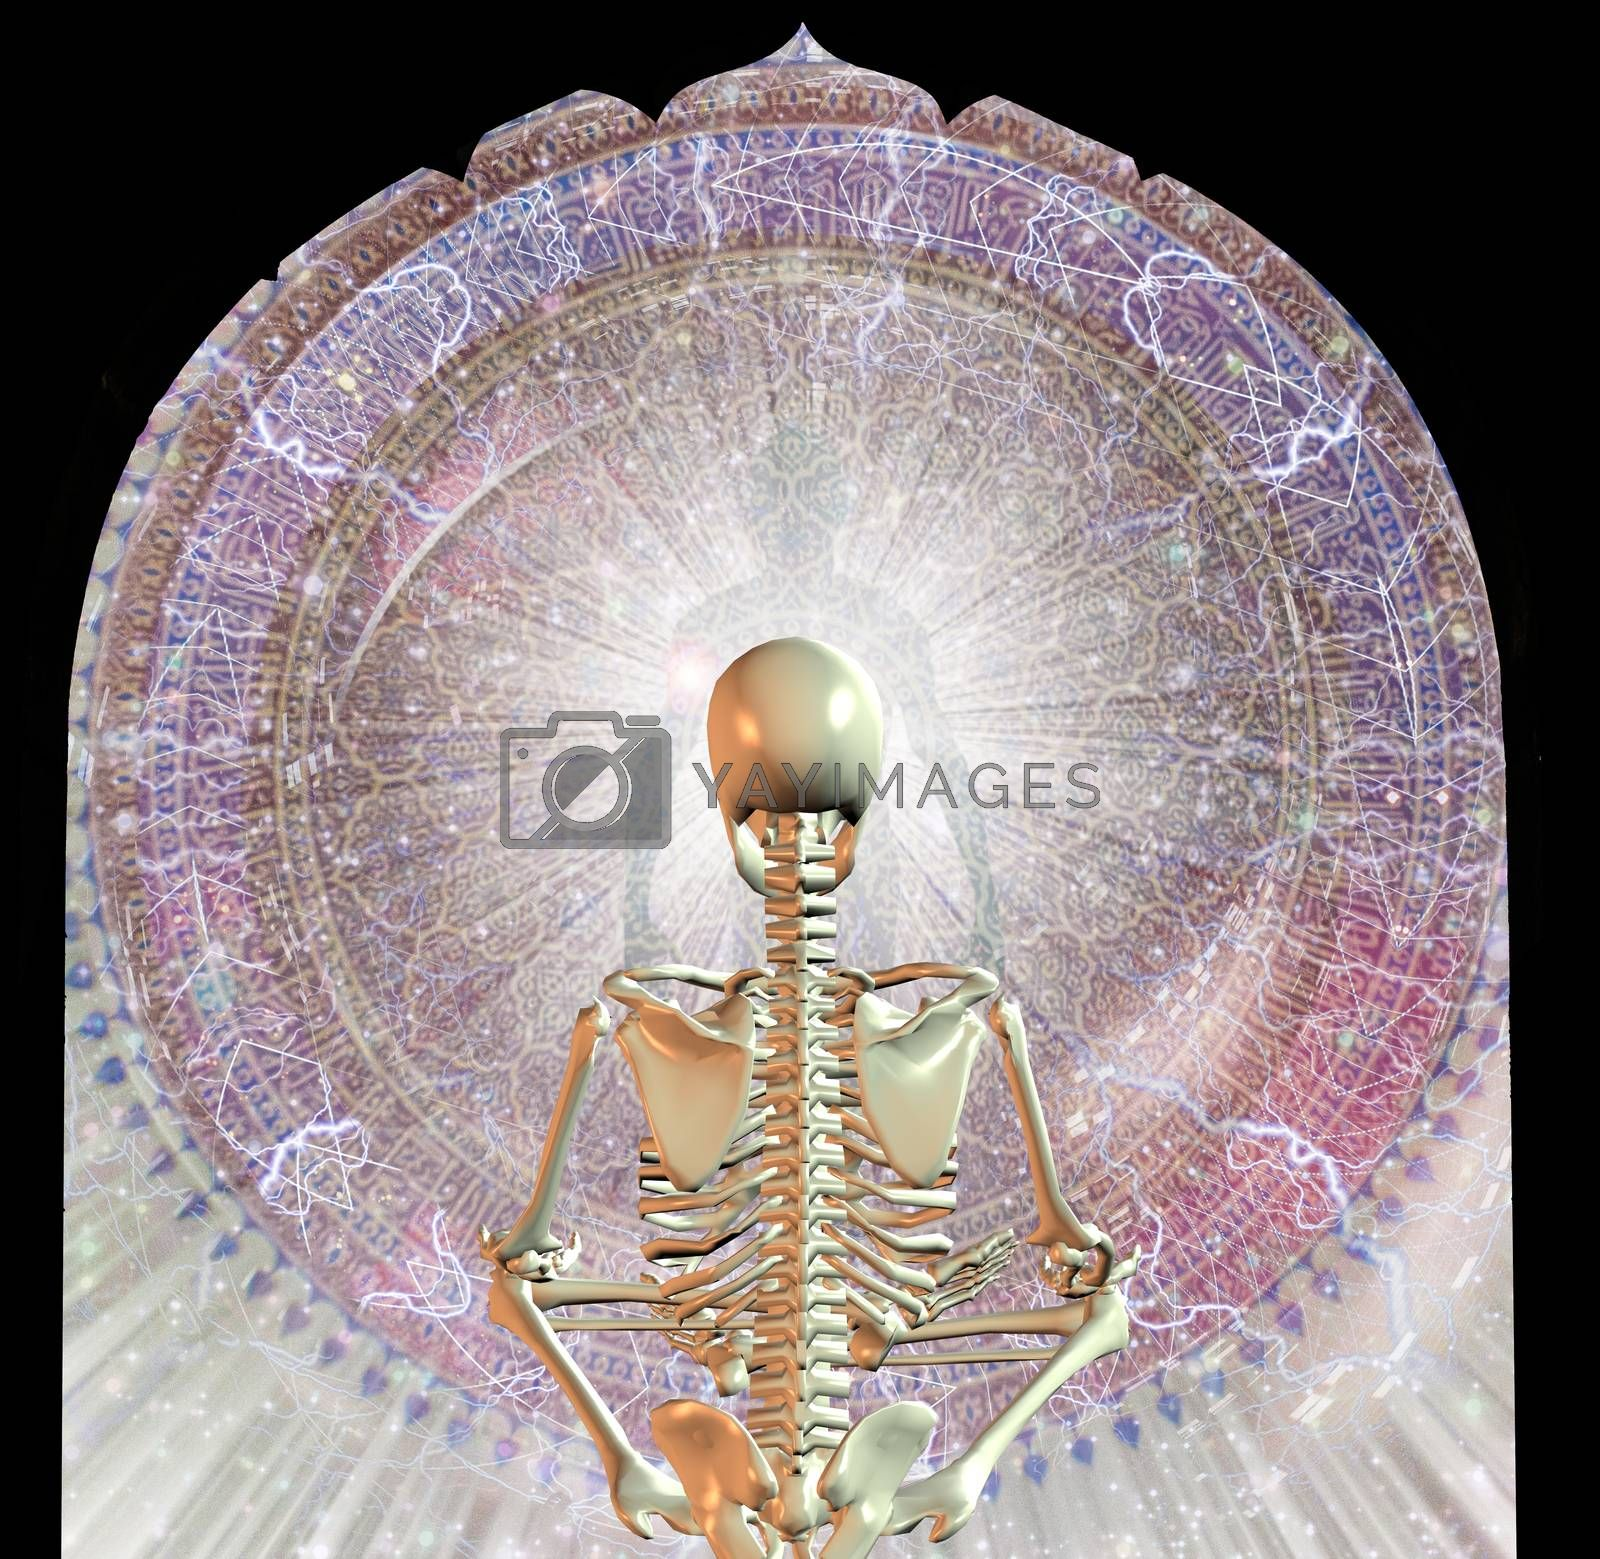 Skeleton sits in pose of lotus before man's aura in rays of light. 3D rendering